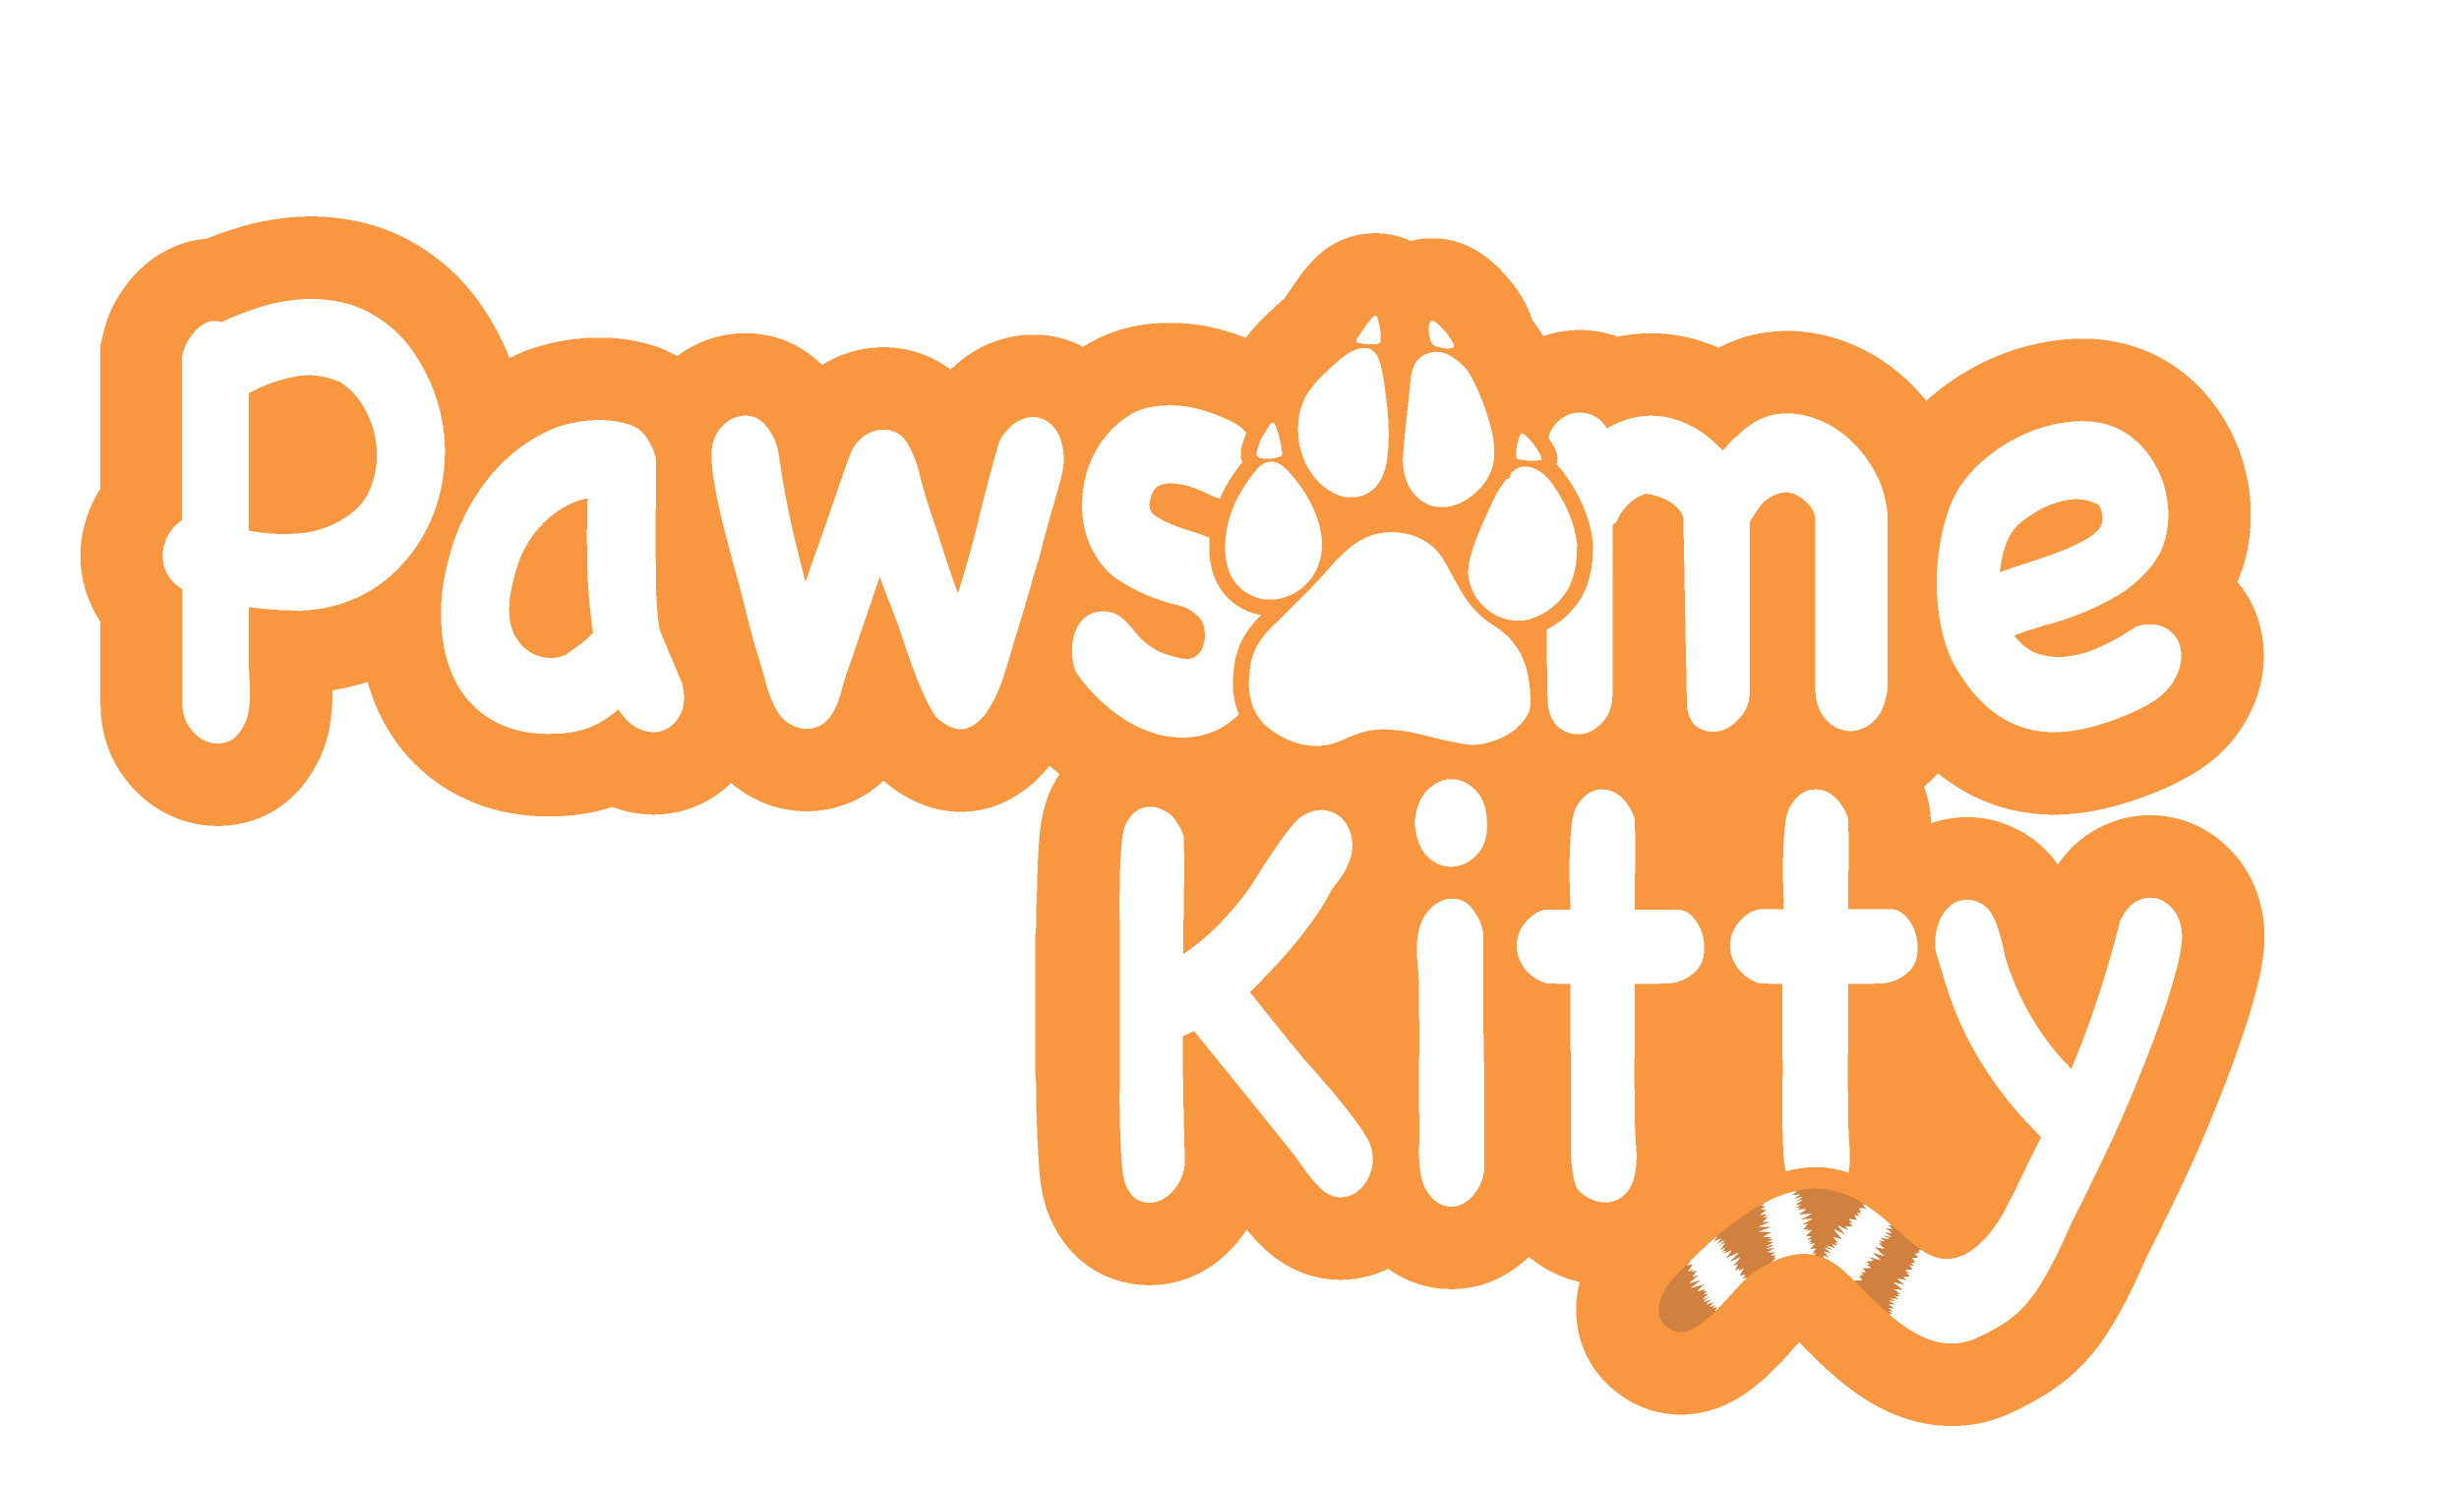 Pawsome Kitty